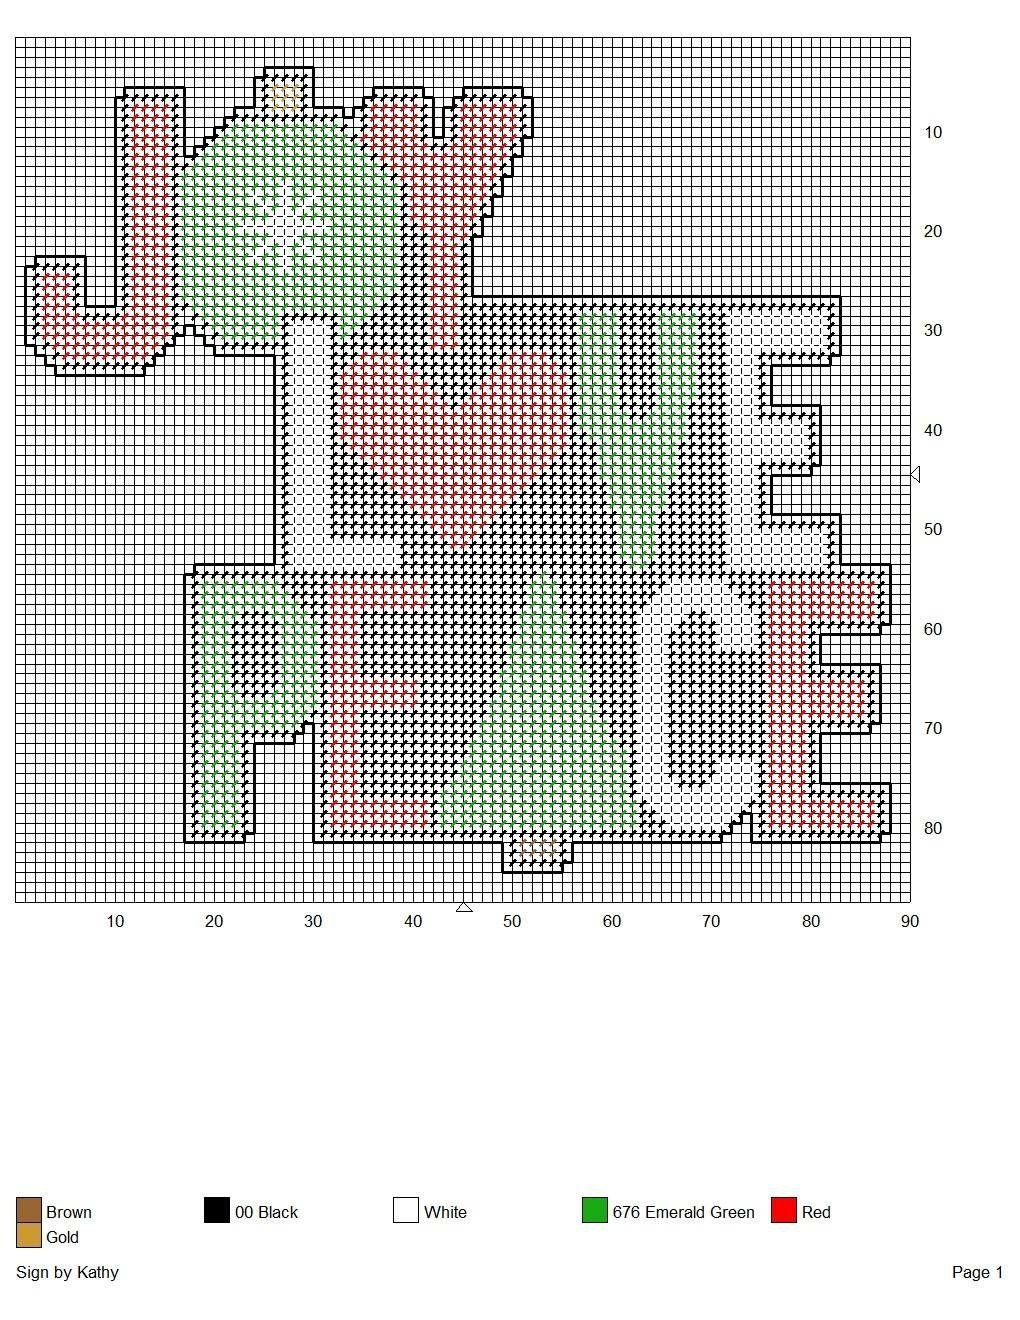 Pin de diyblue en Crochet Christmas Afghans   Pinterest   Tren y Navidad